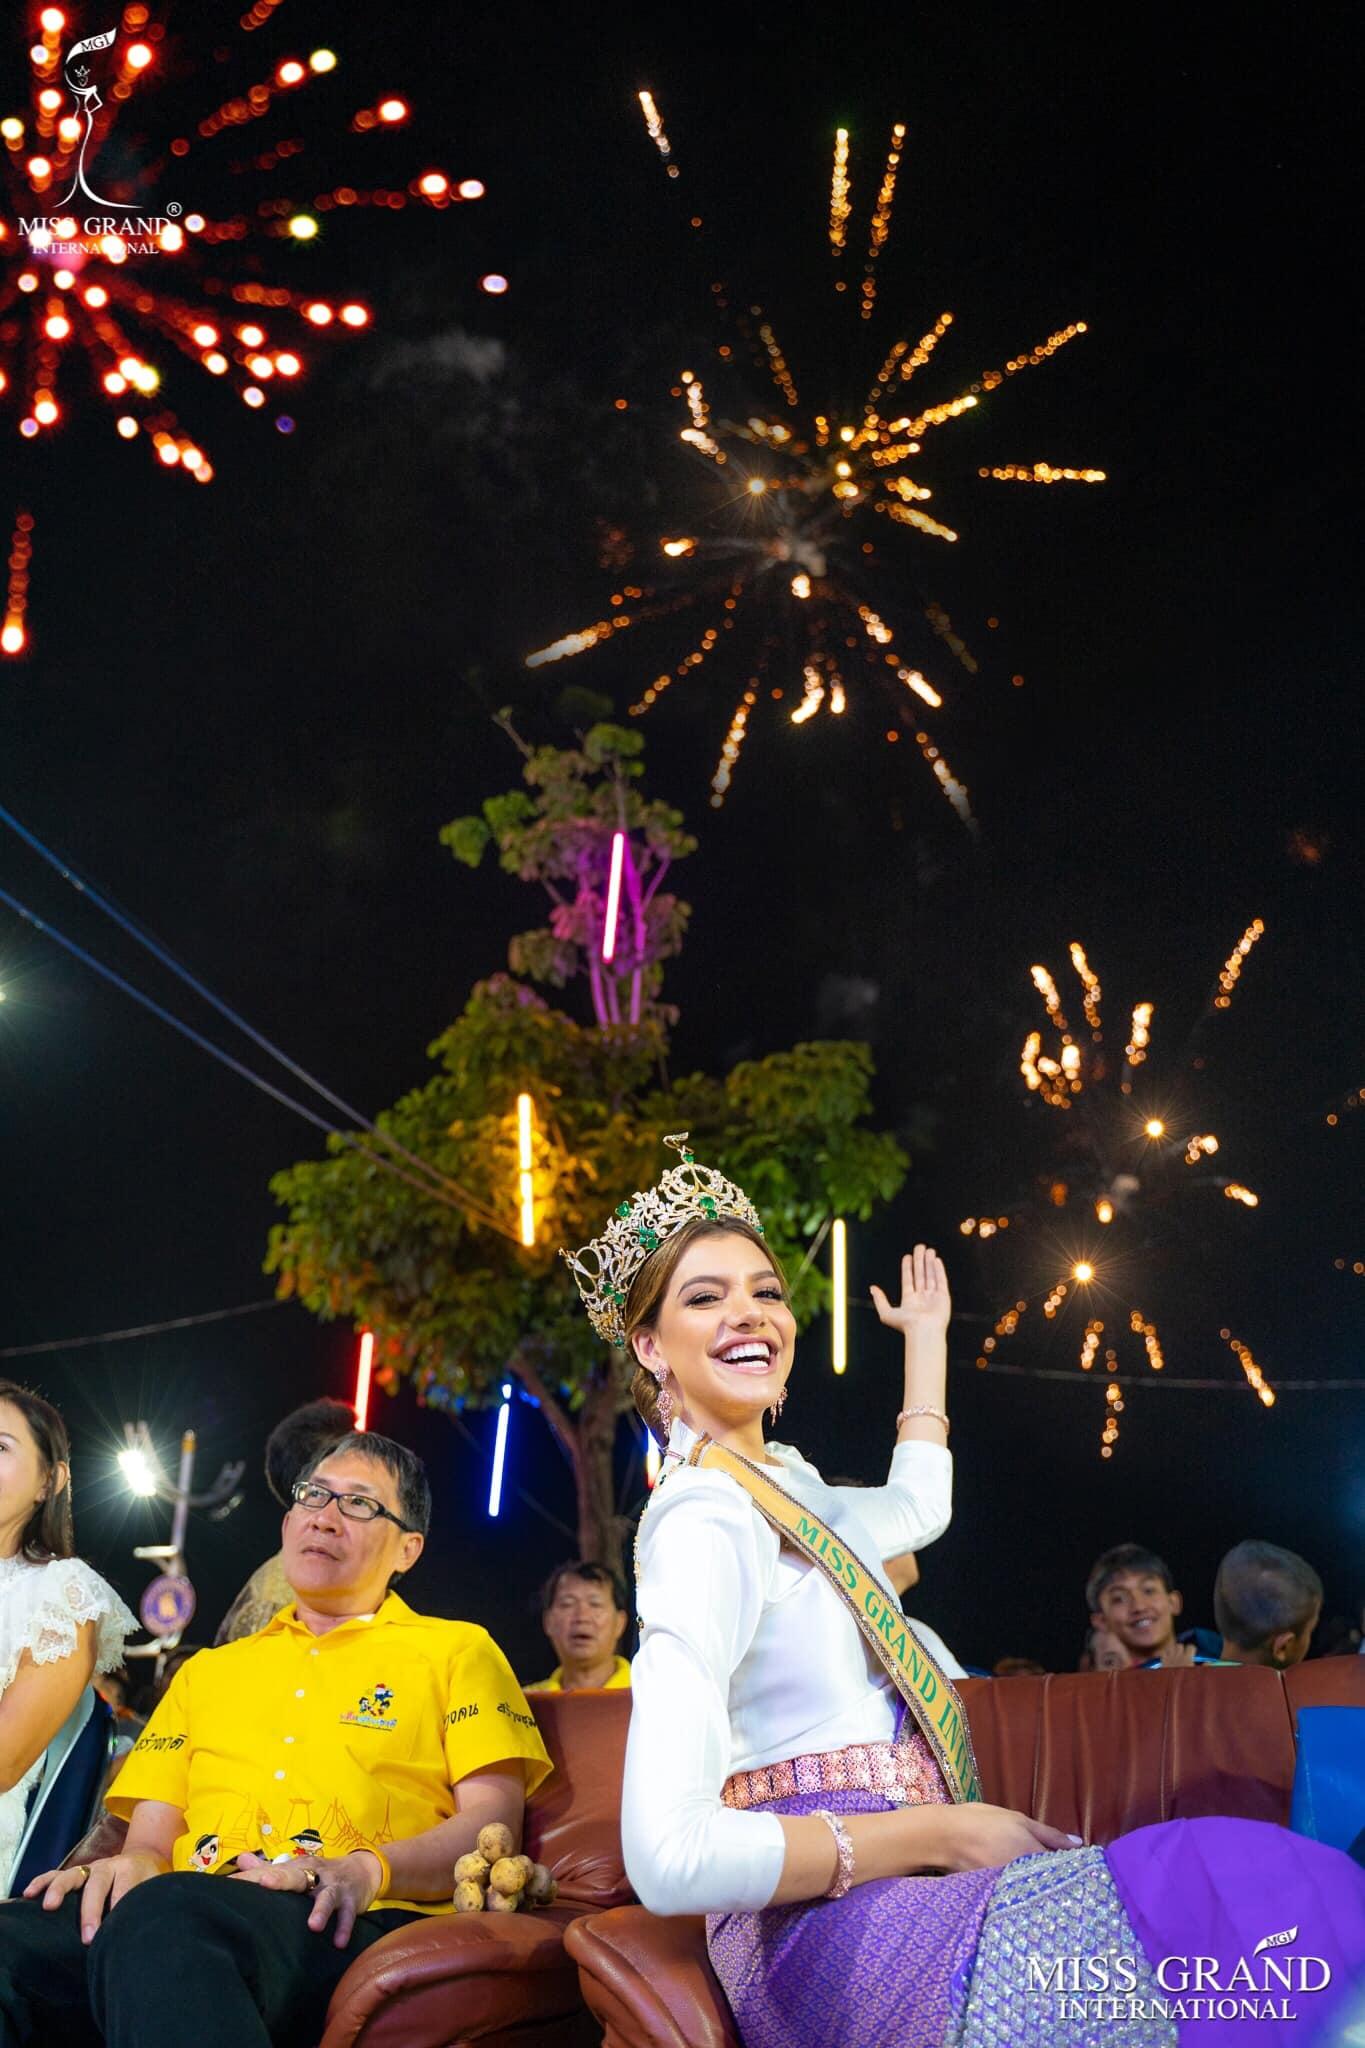 lourdes valentina figuera, miss grand international 2019. - Página 21 P0fkq10